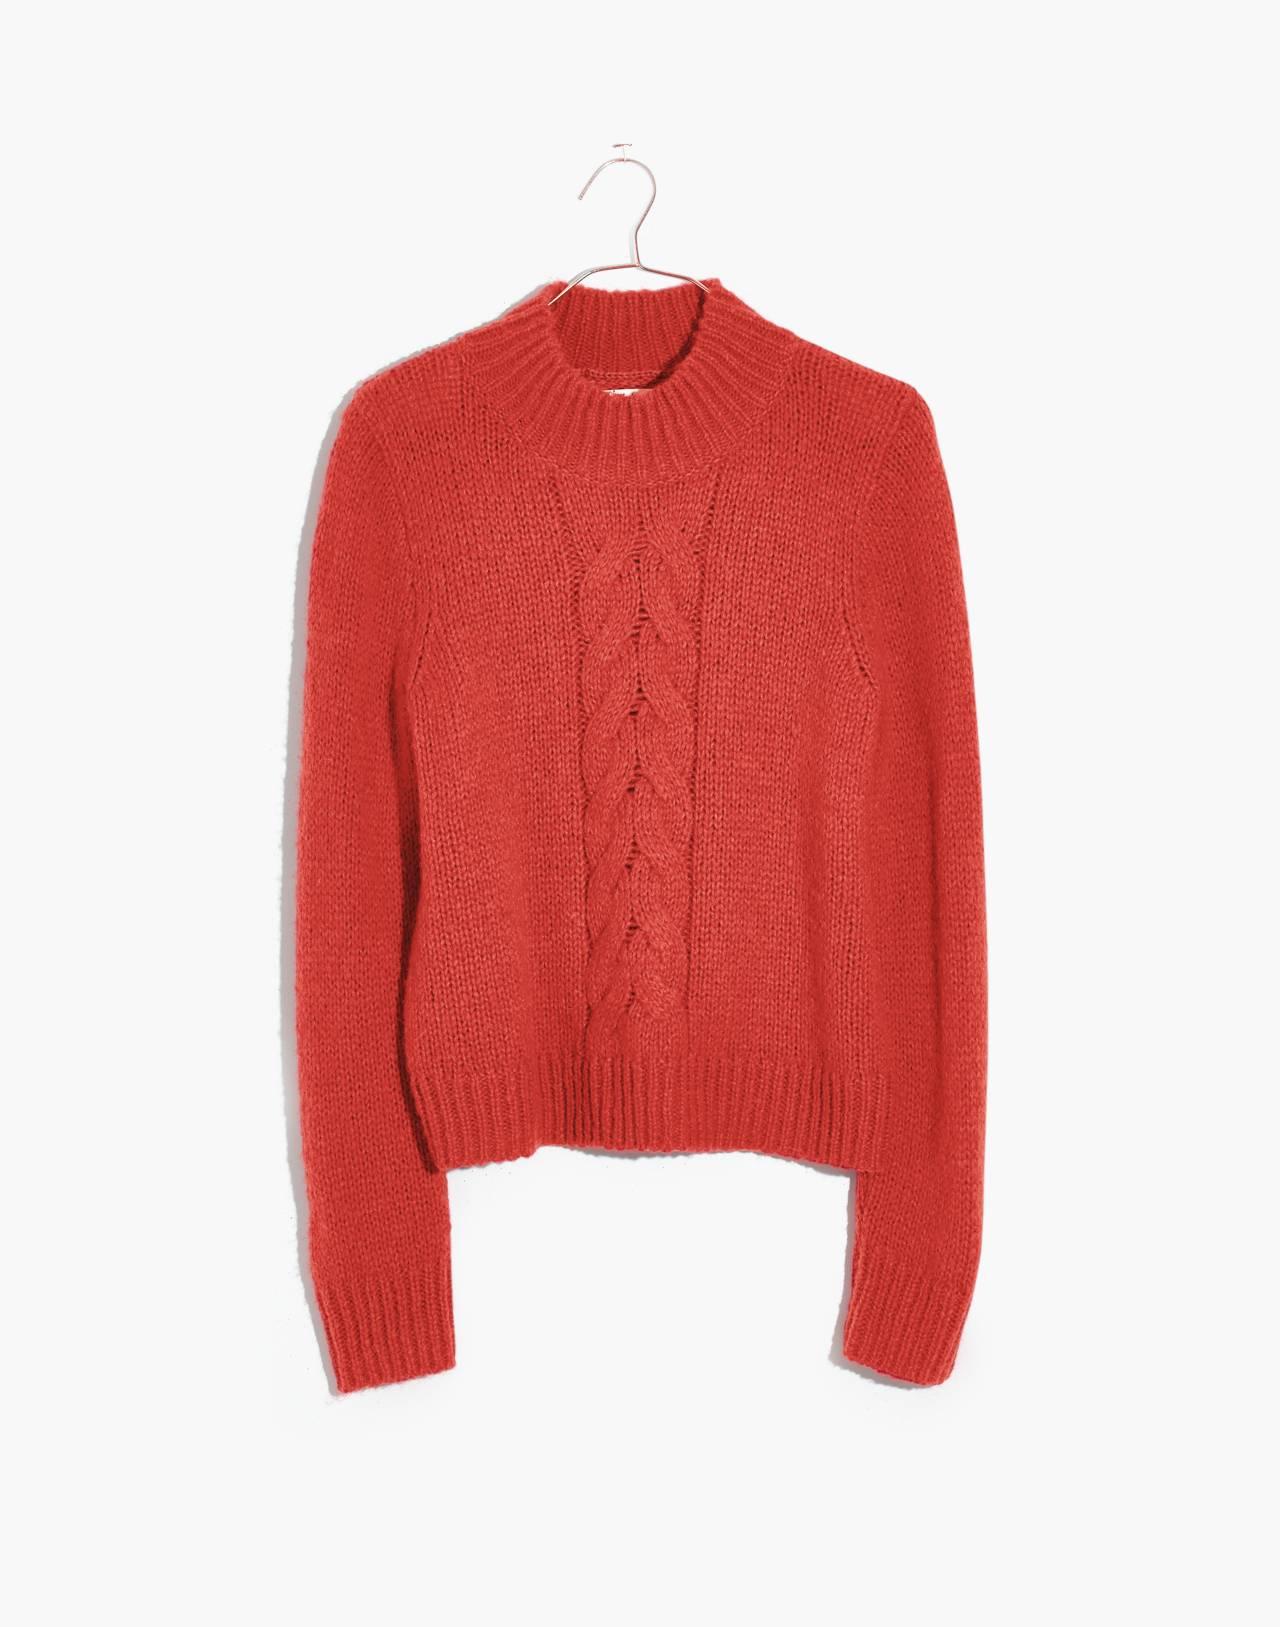 Bayfront Turtleneck Sweater in bright scarlett image 4